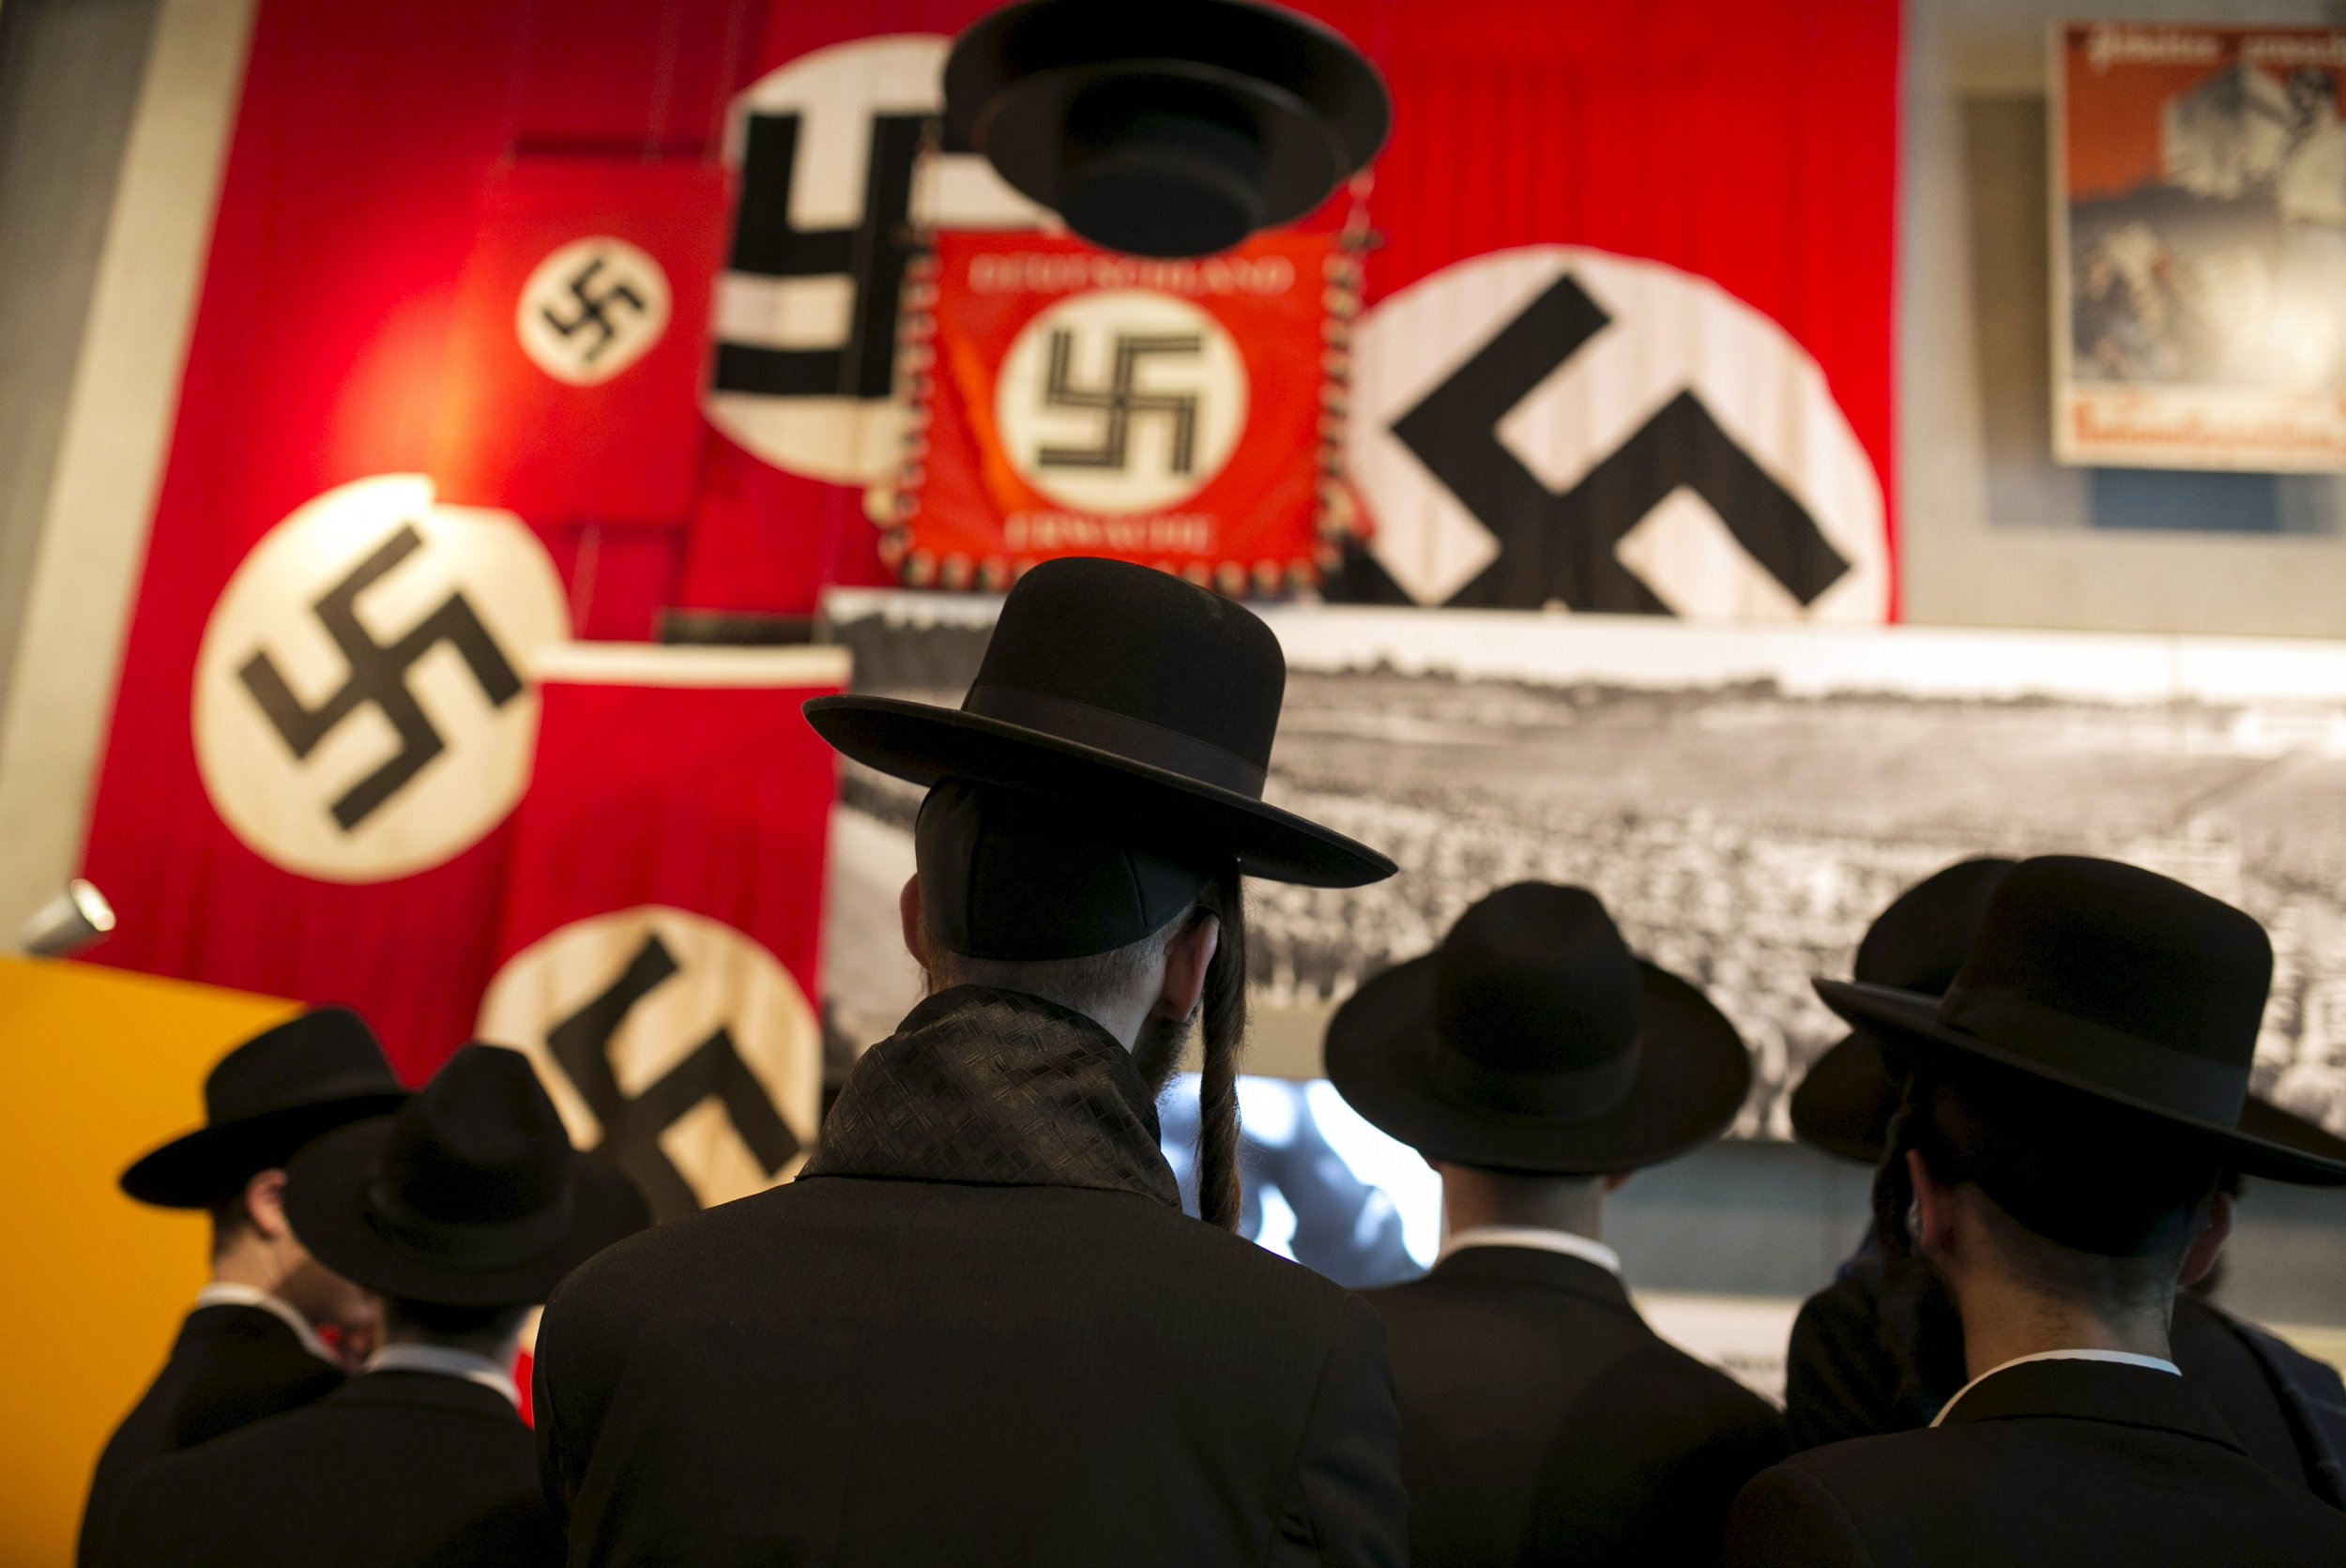 Benjamin Netanyahu vows to give back south Tel Aviv to Israelis - Israel News - Jerusalem Post